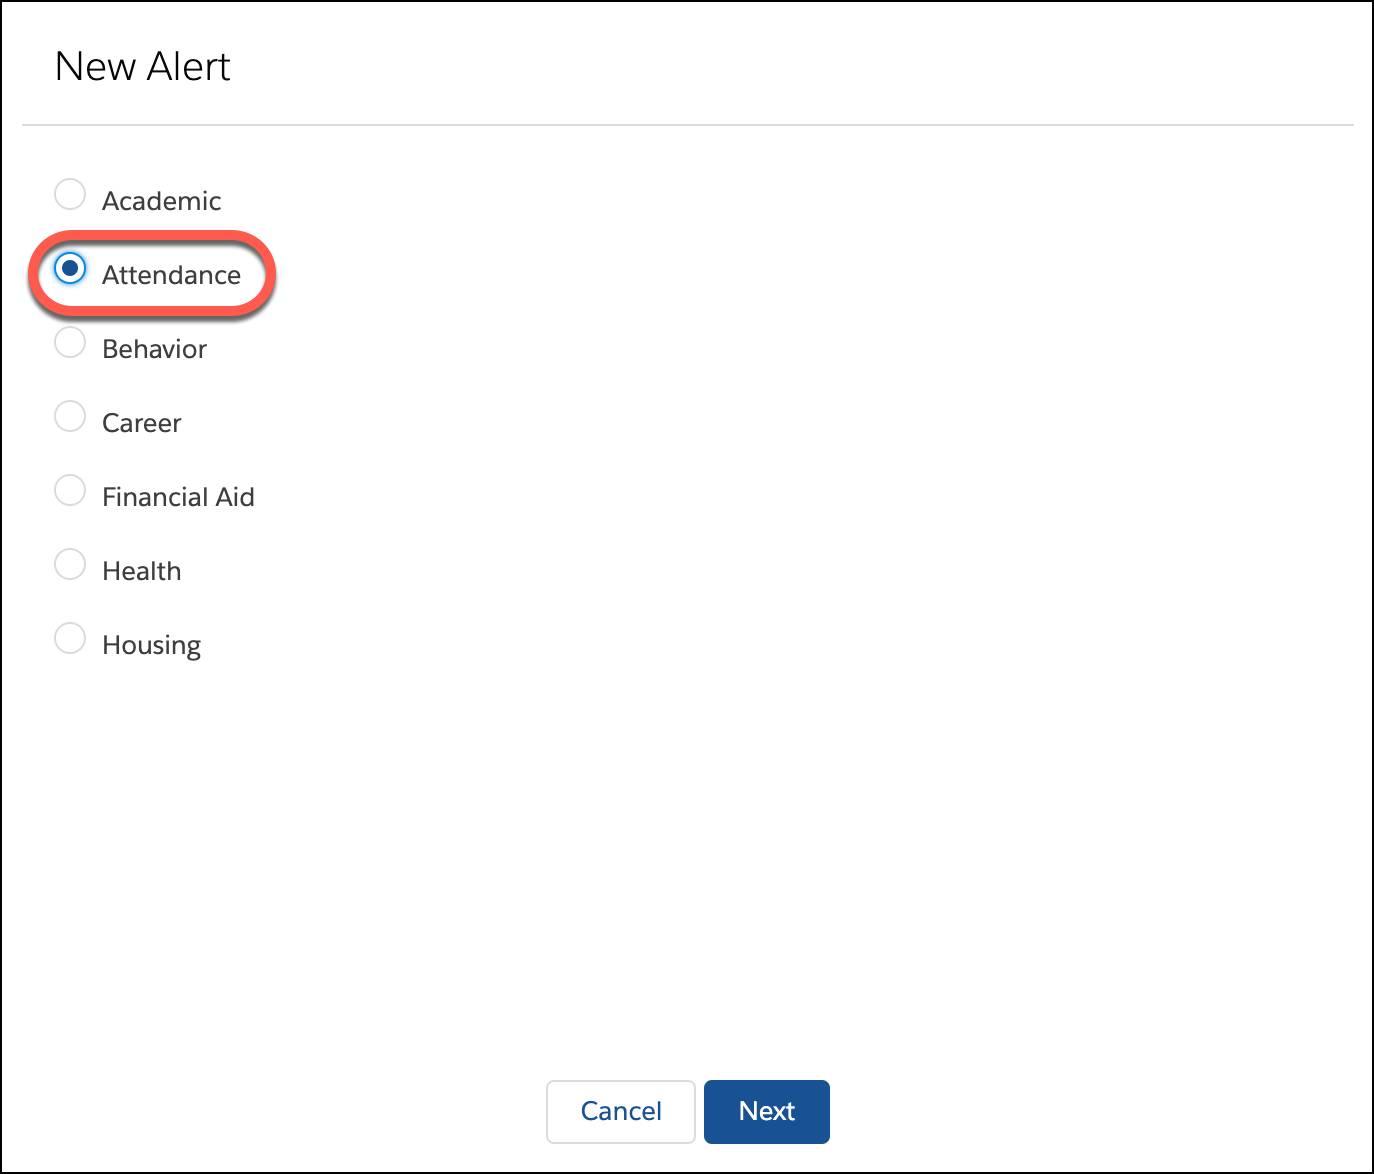 New Alert type